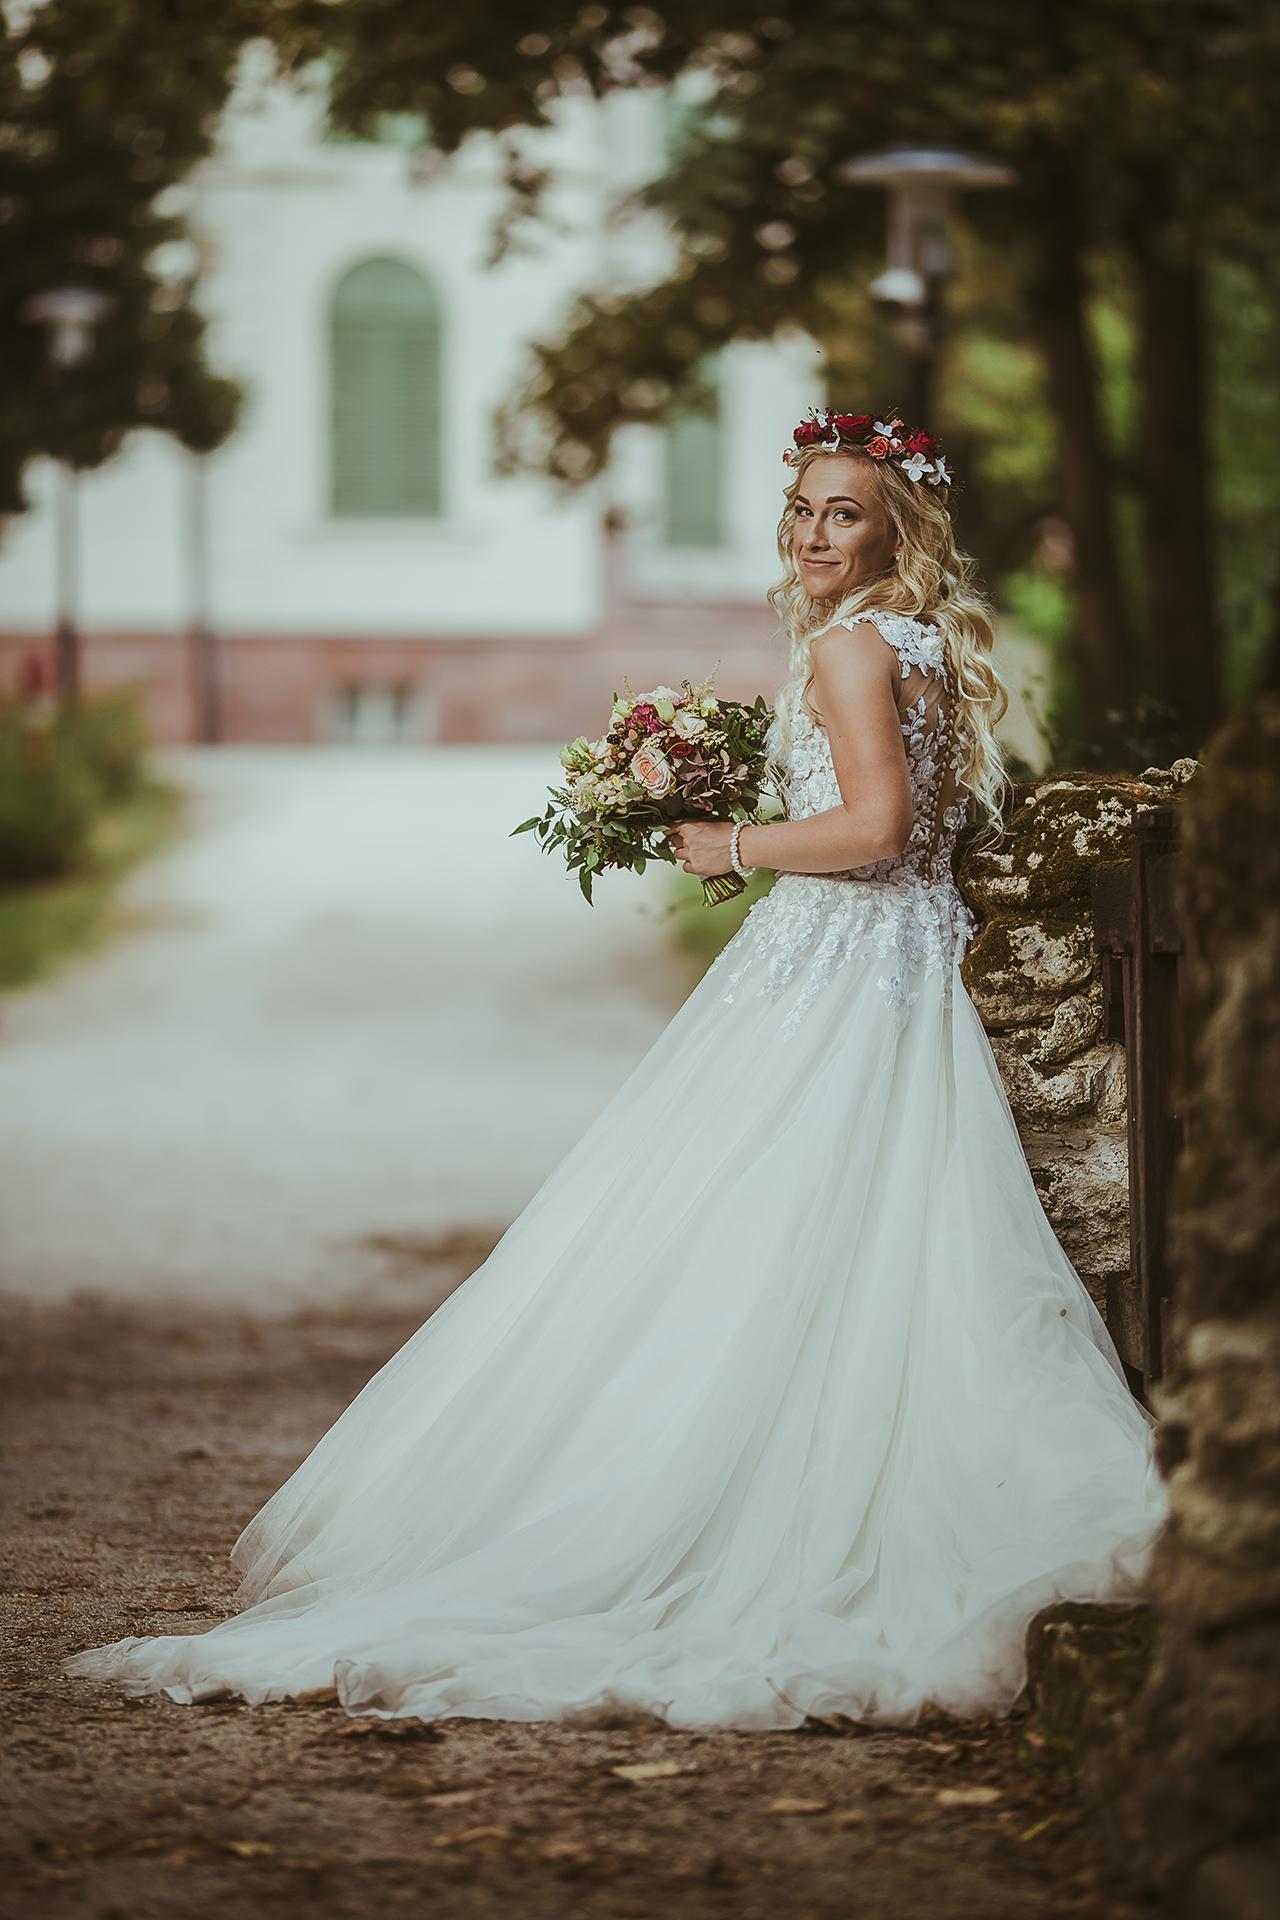 ©2018 Marko-foto.sk